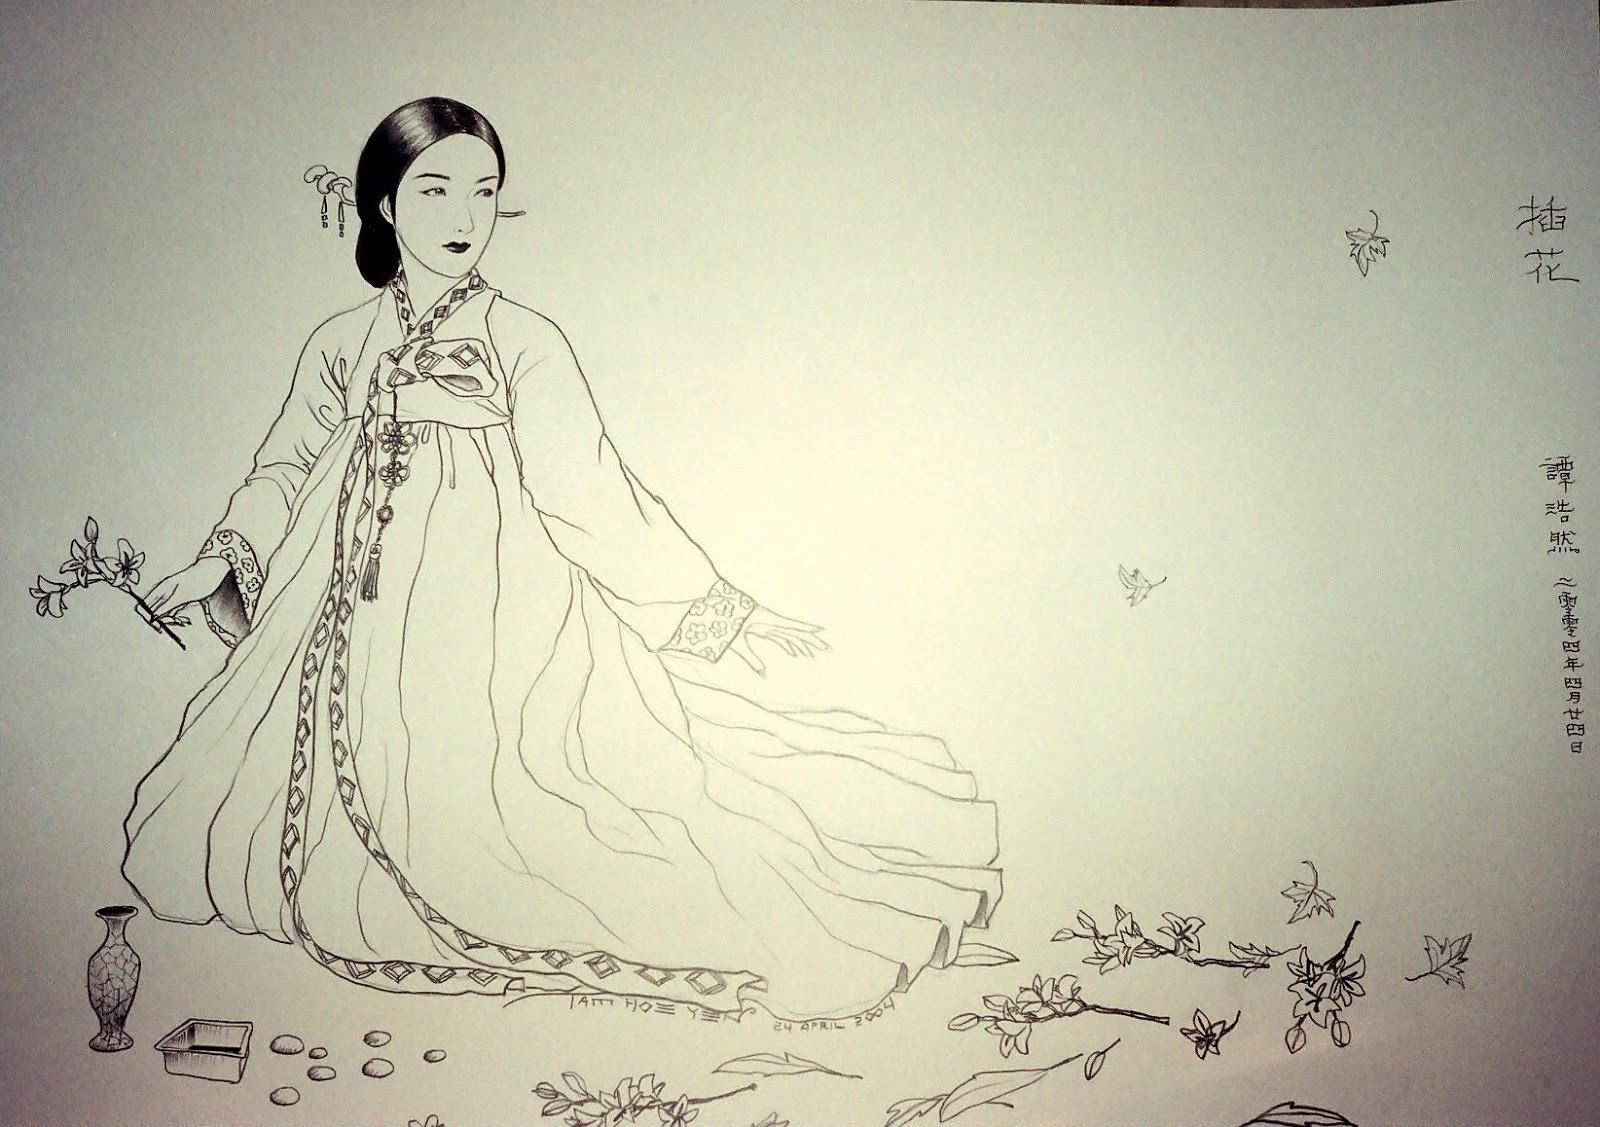 Korean women pencil drawings 2004